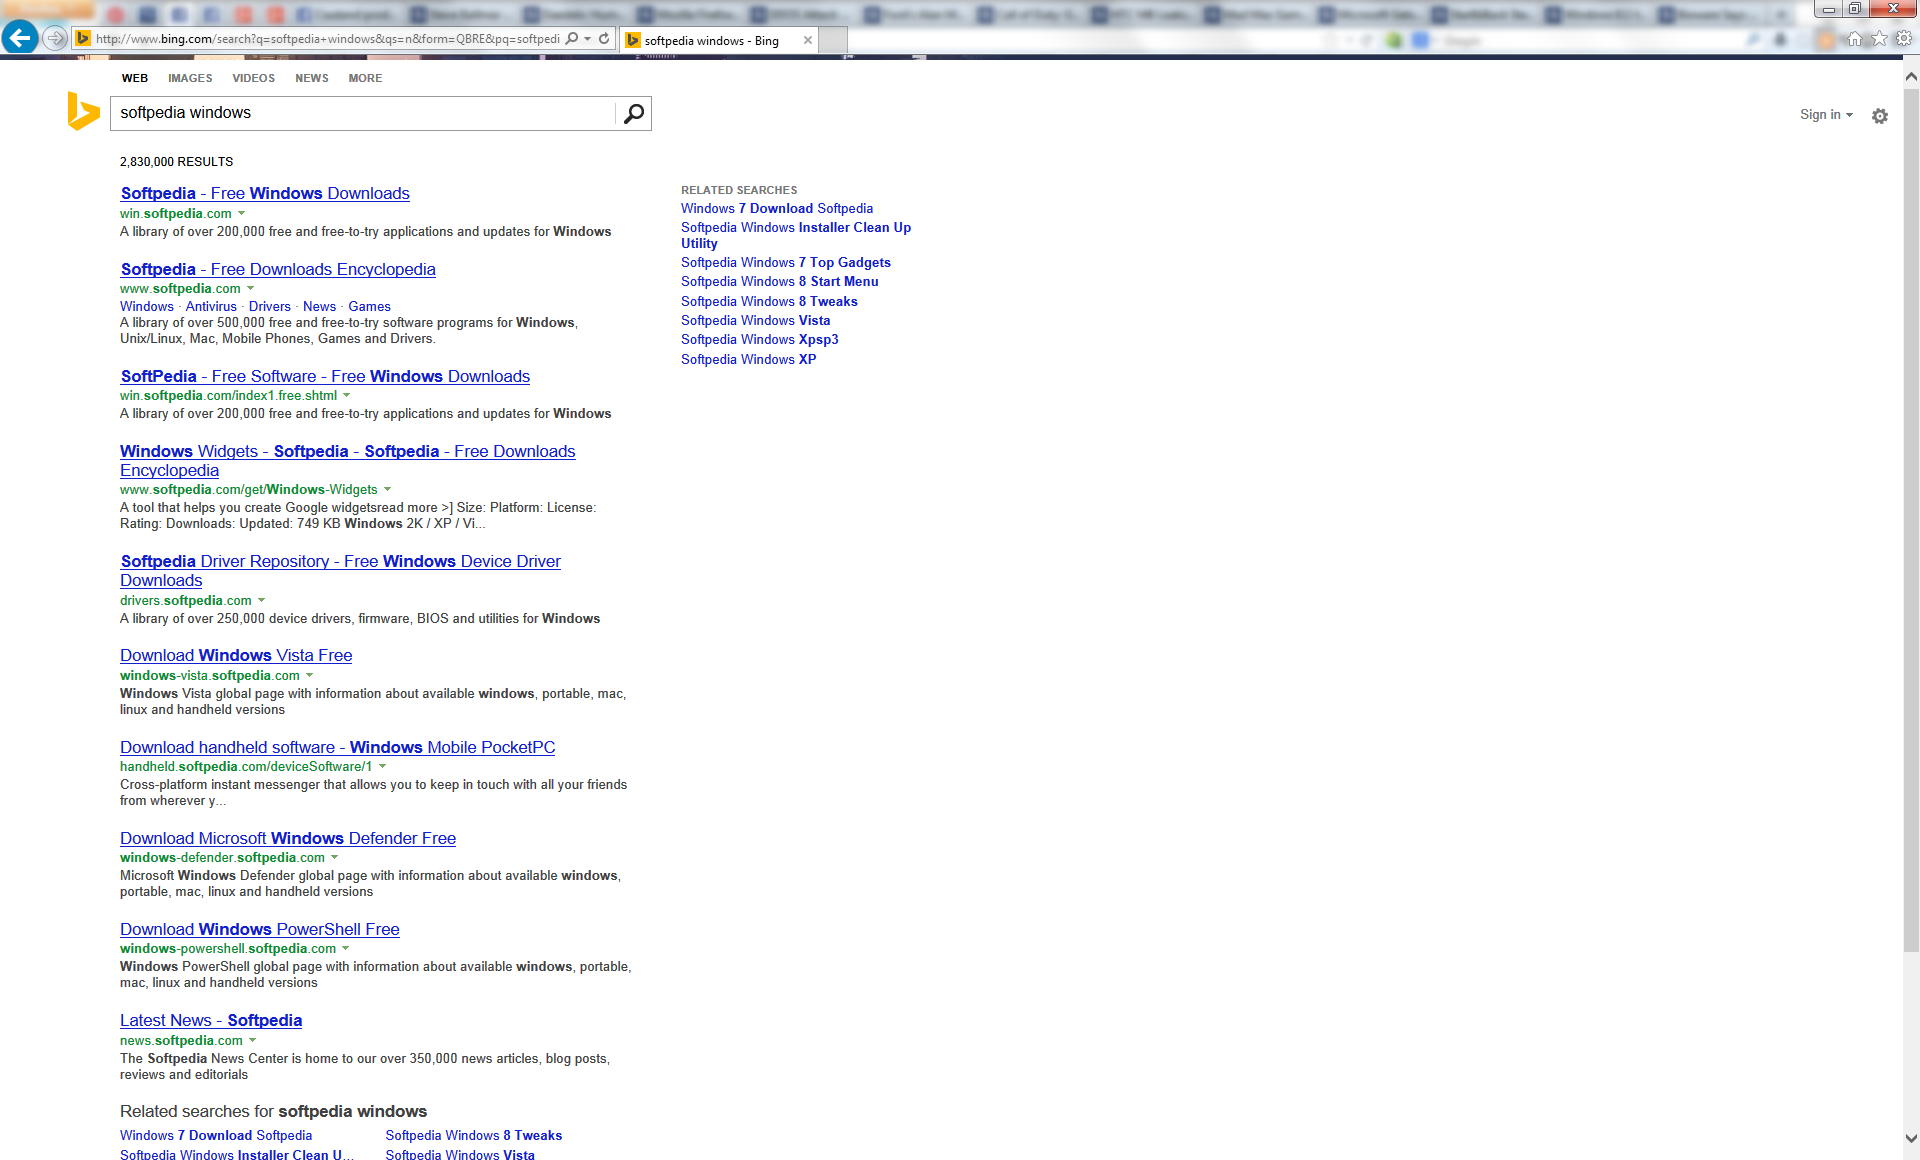 Internet explorer 11 for windows 7 blurry font issues softpedia